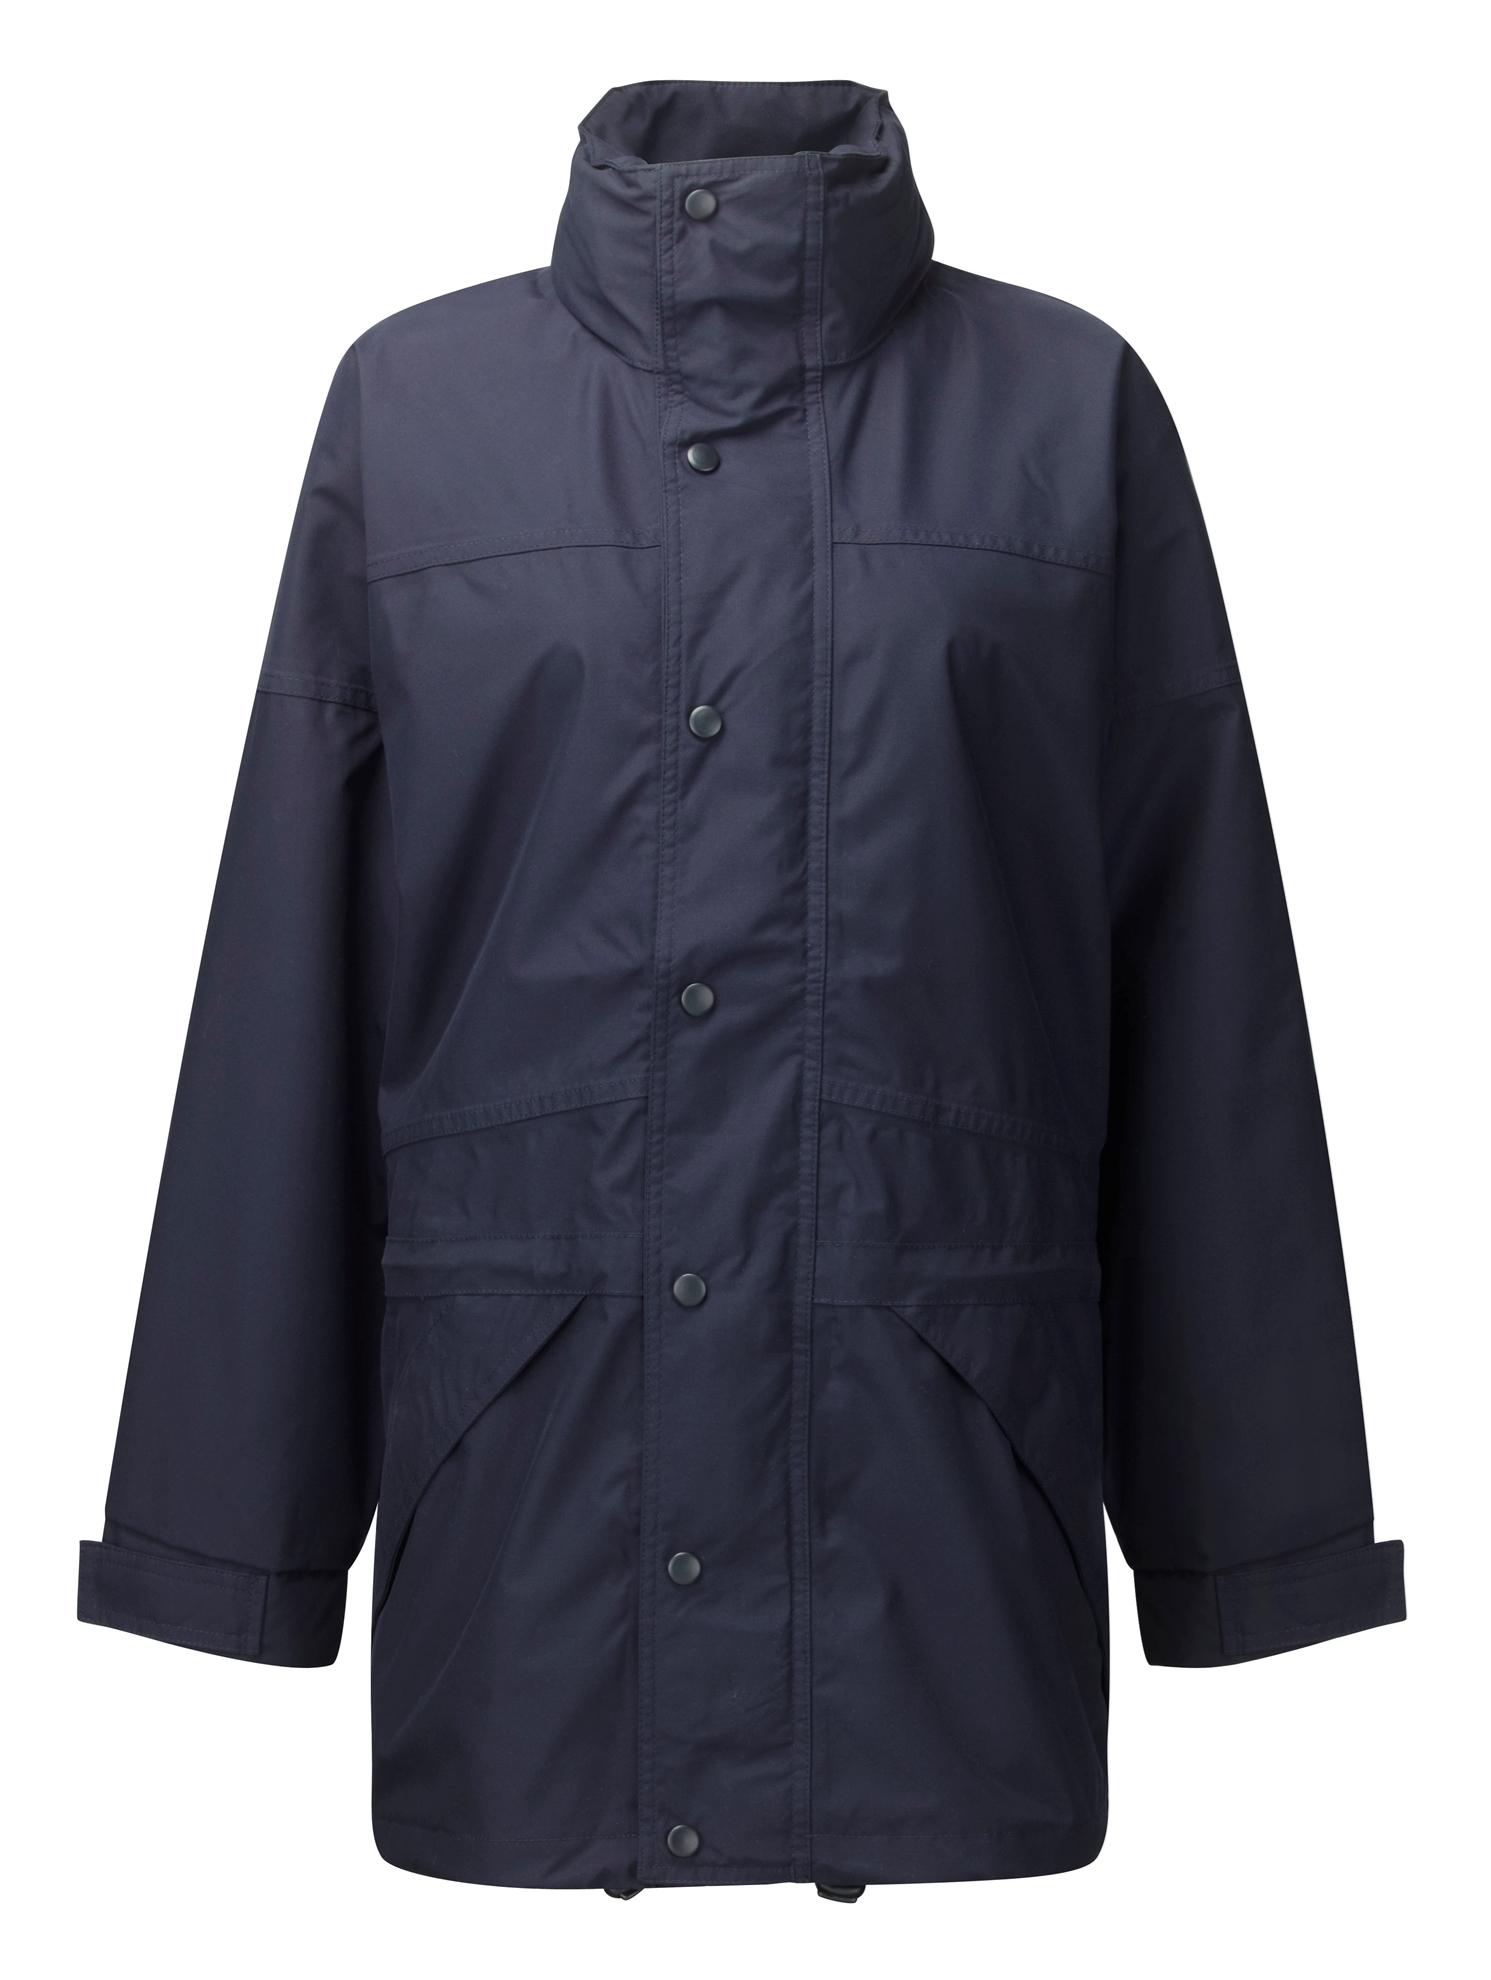 Picture of Waterproof Anorak with Lined Fleece - Navy